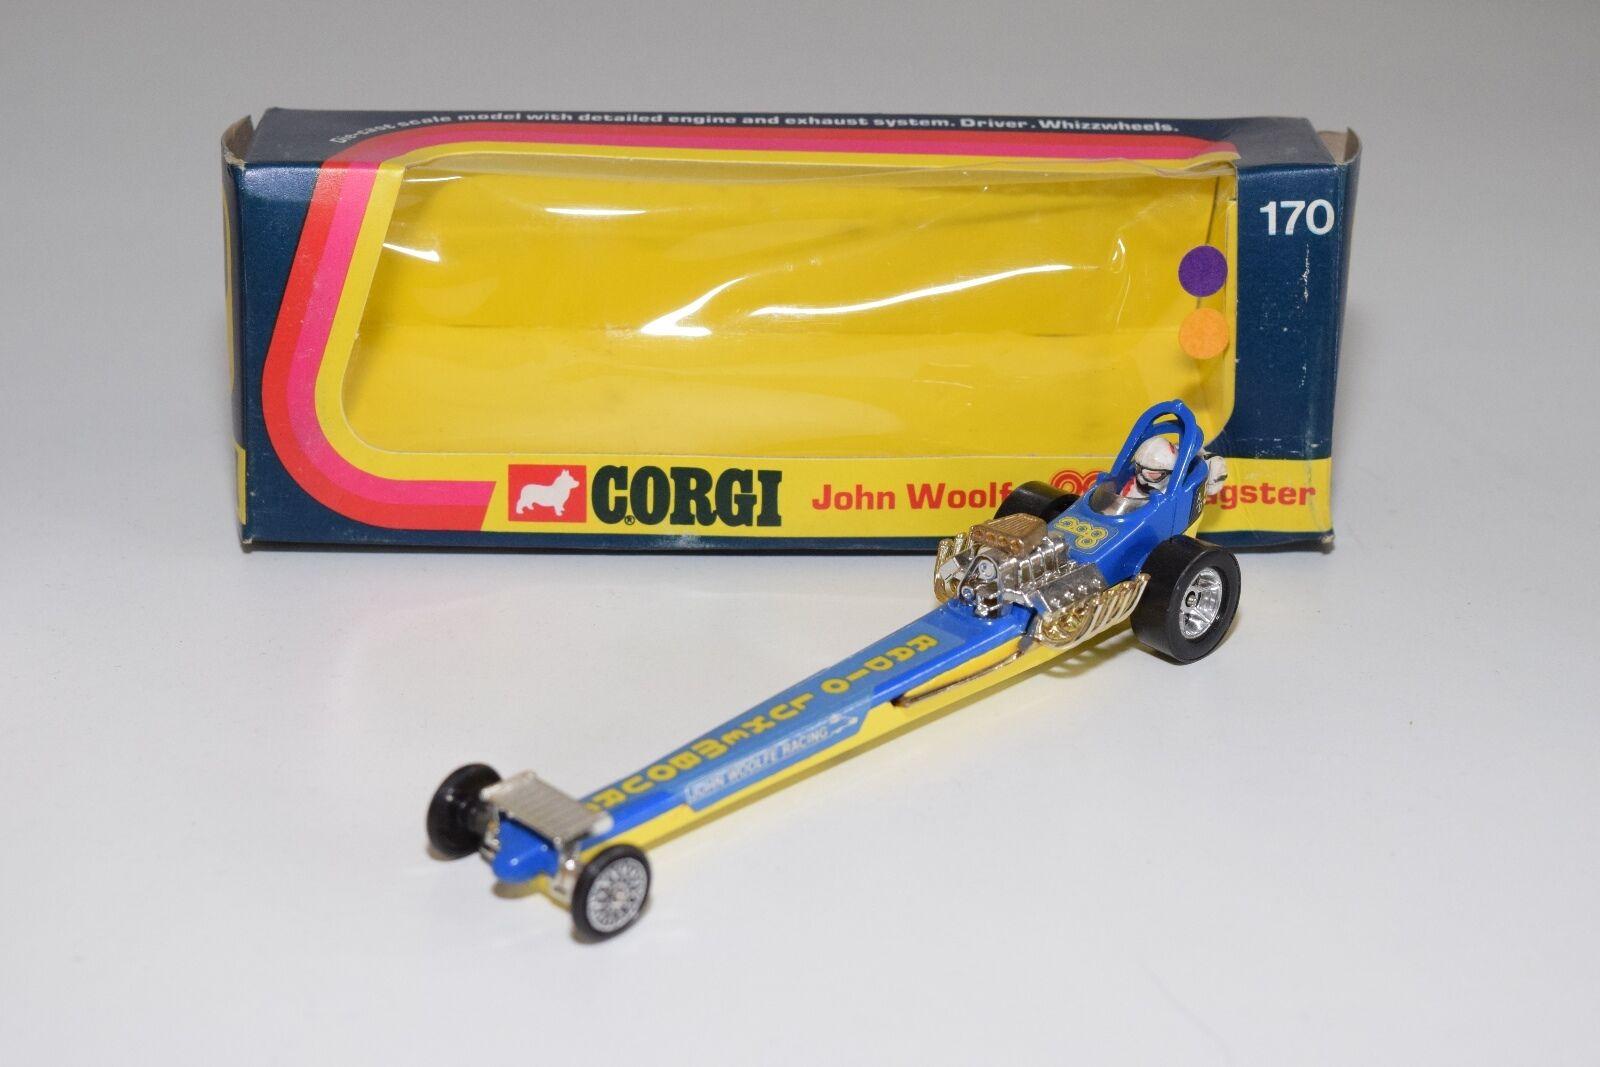 \\ CORGI TOYS 170 JOHN WOOLFE DRAGSTER Blau Gelb MINT BOXED